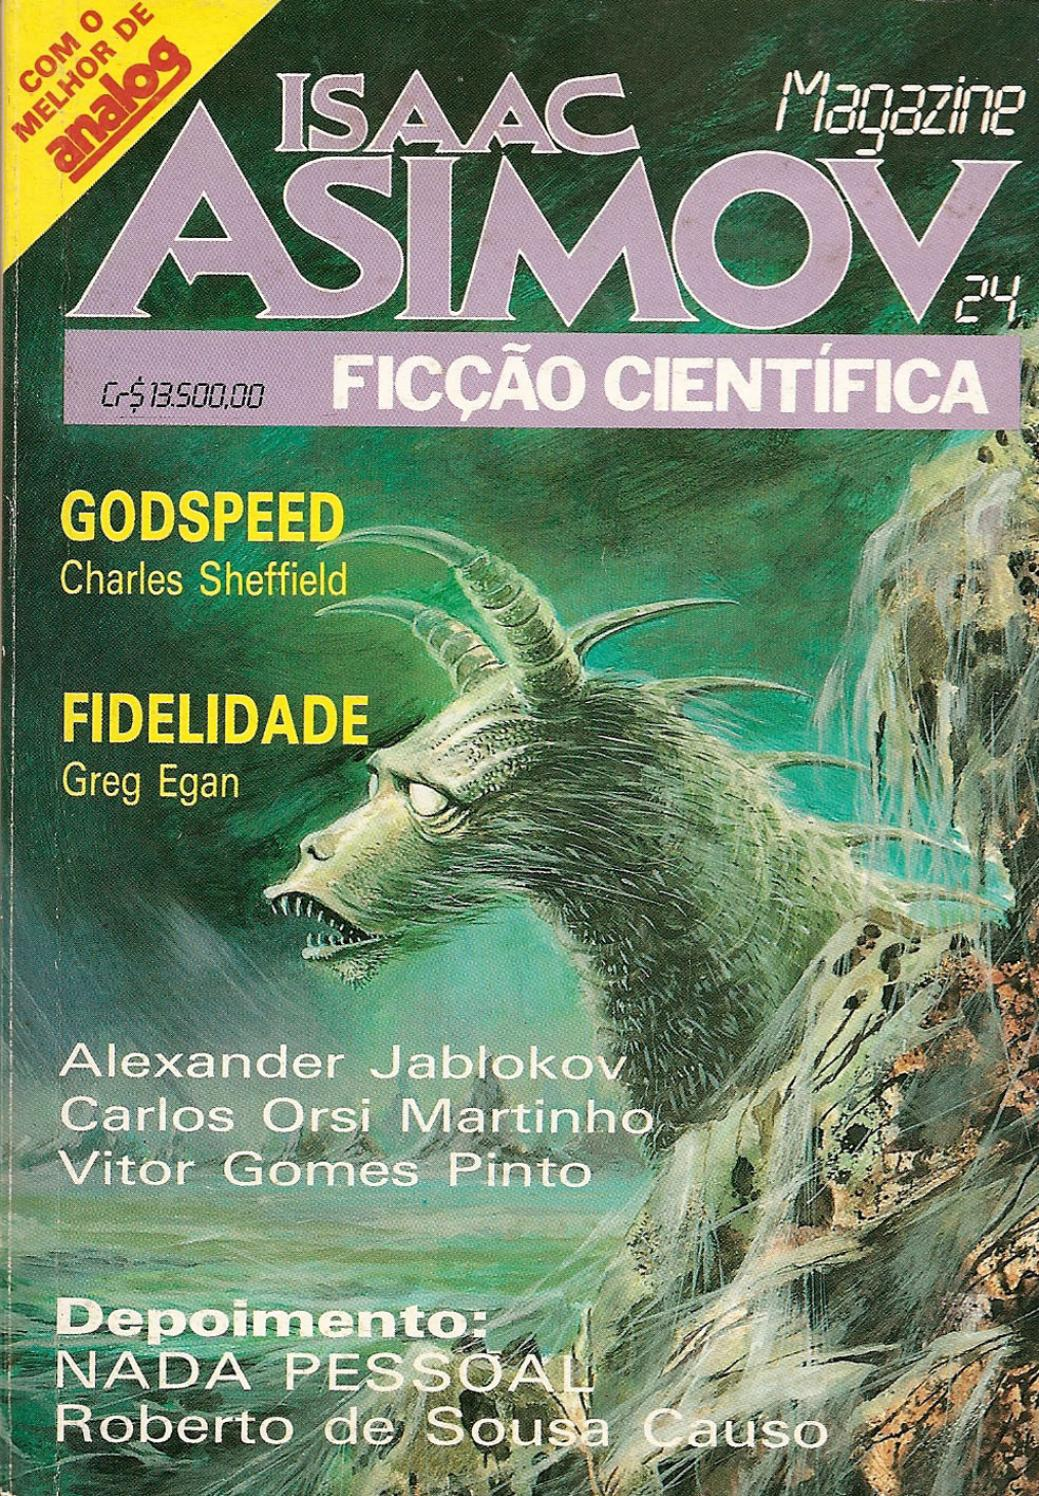 9b1a62e95f8 Isaac asimov magazine 24  pt  by Reinaldo Alberto - issuu